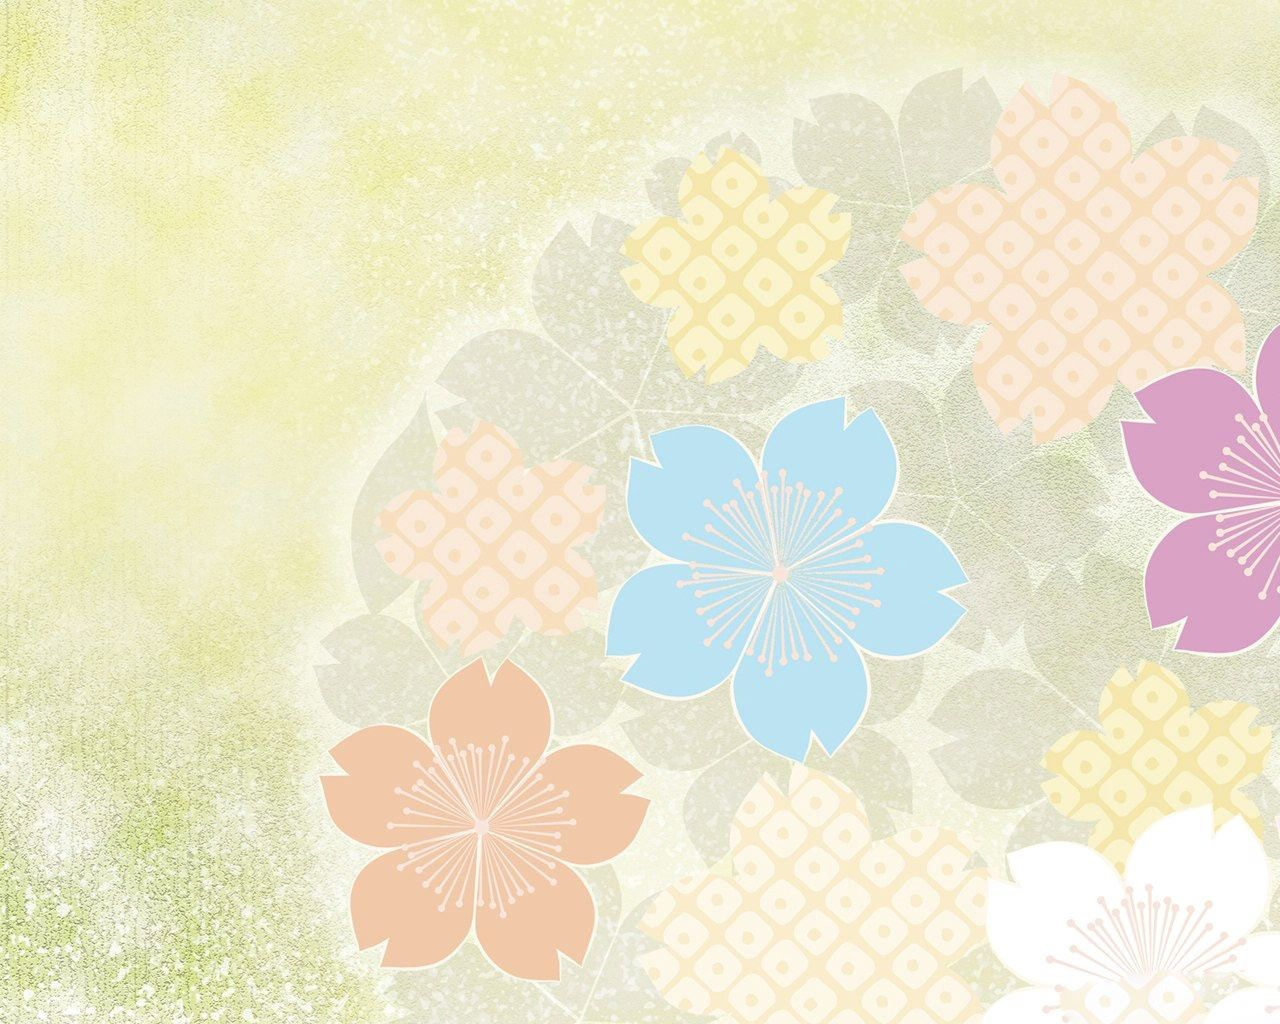 4e3d3cf059 Fondos Color Pastel Hq Textura Dibujo Ornamento Imagen Wallpaper ...